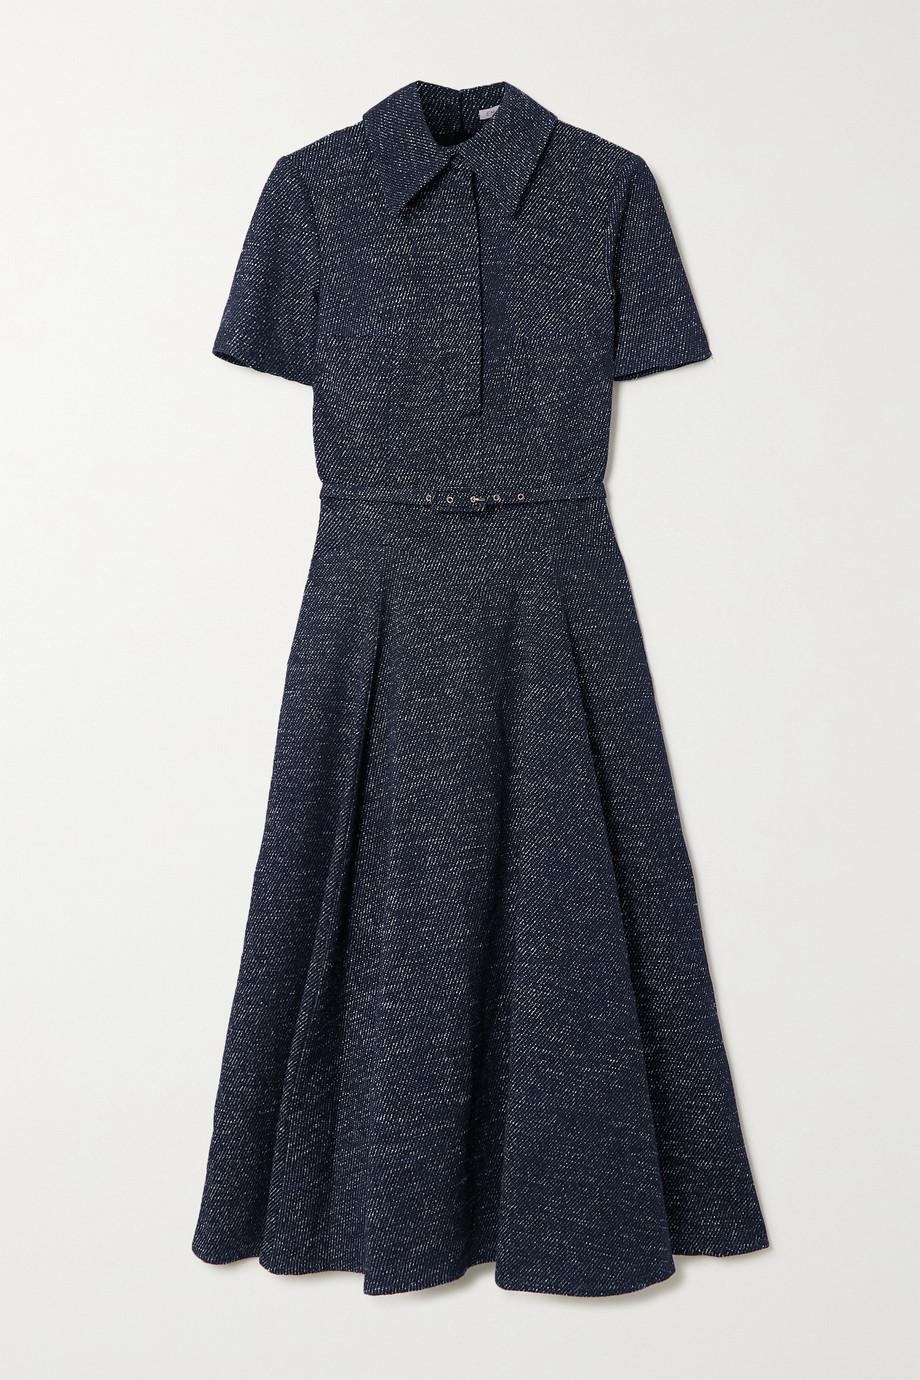 Emilia Wickstead Jody Midi-Hemdblusenkleid aus Denim mit Gürtel